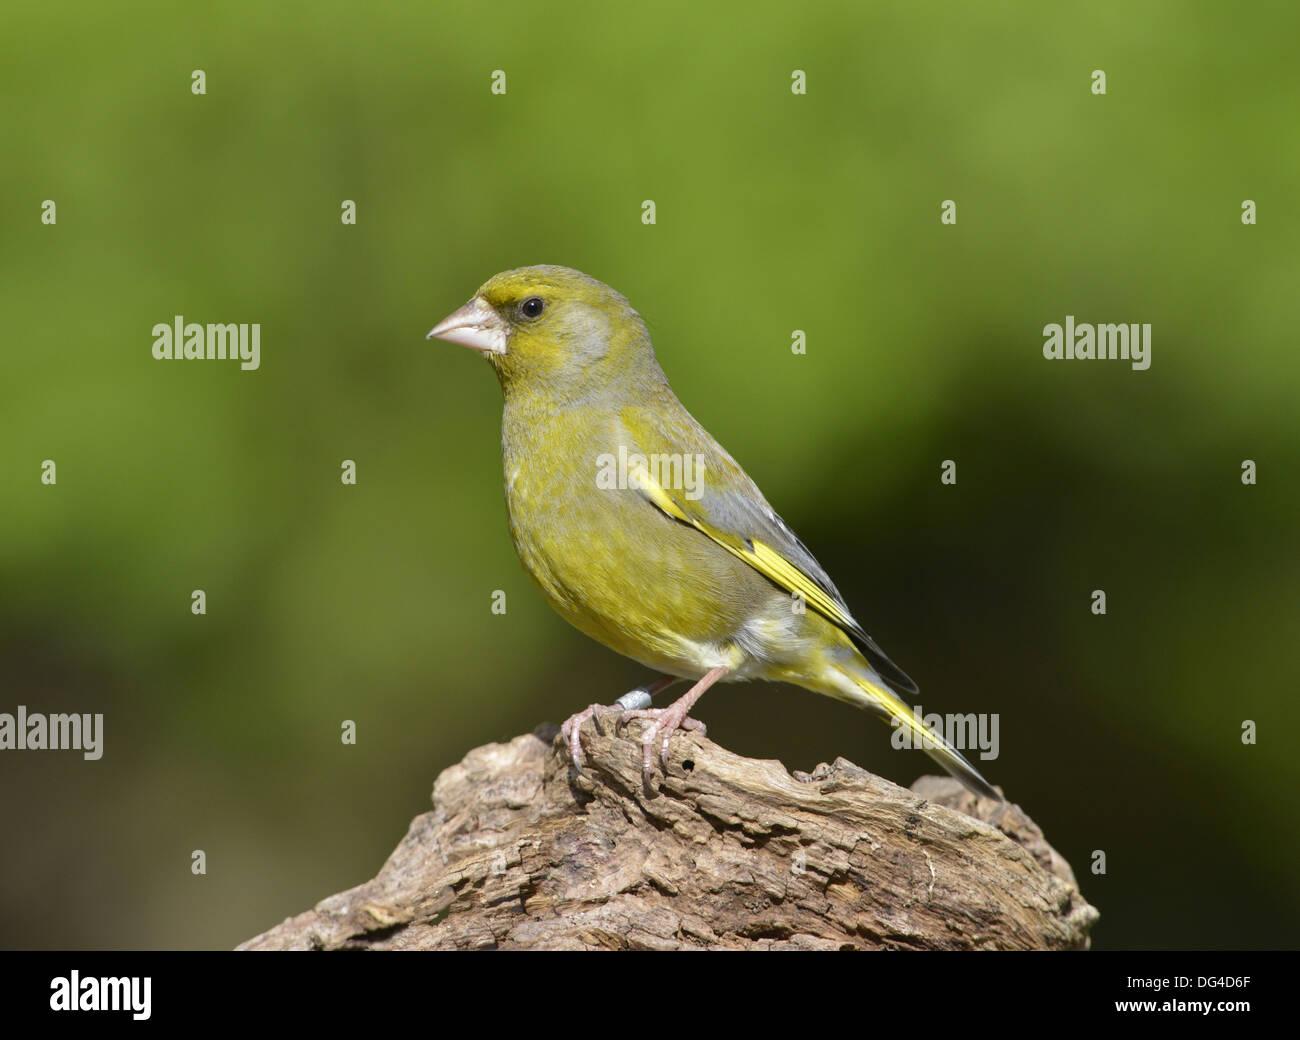 Greenfinch Carduelis chloris Stock Photo